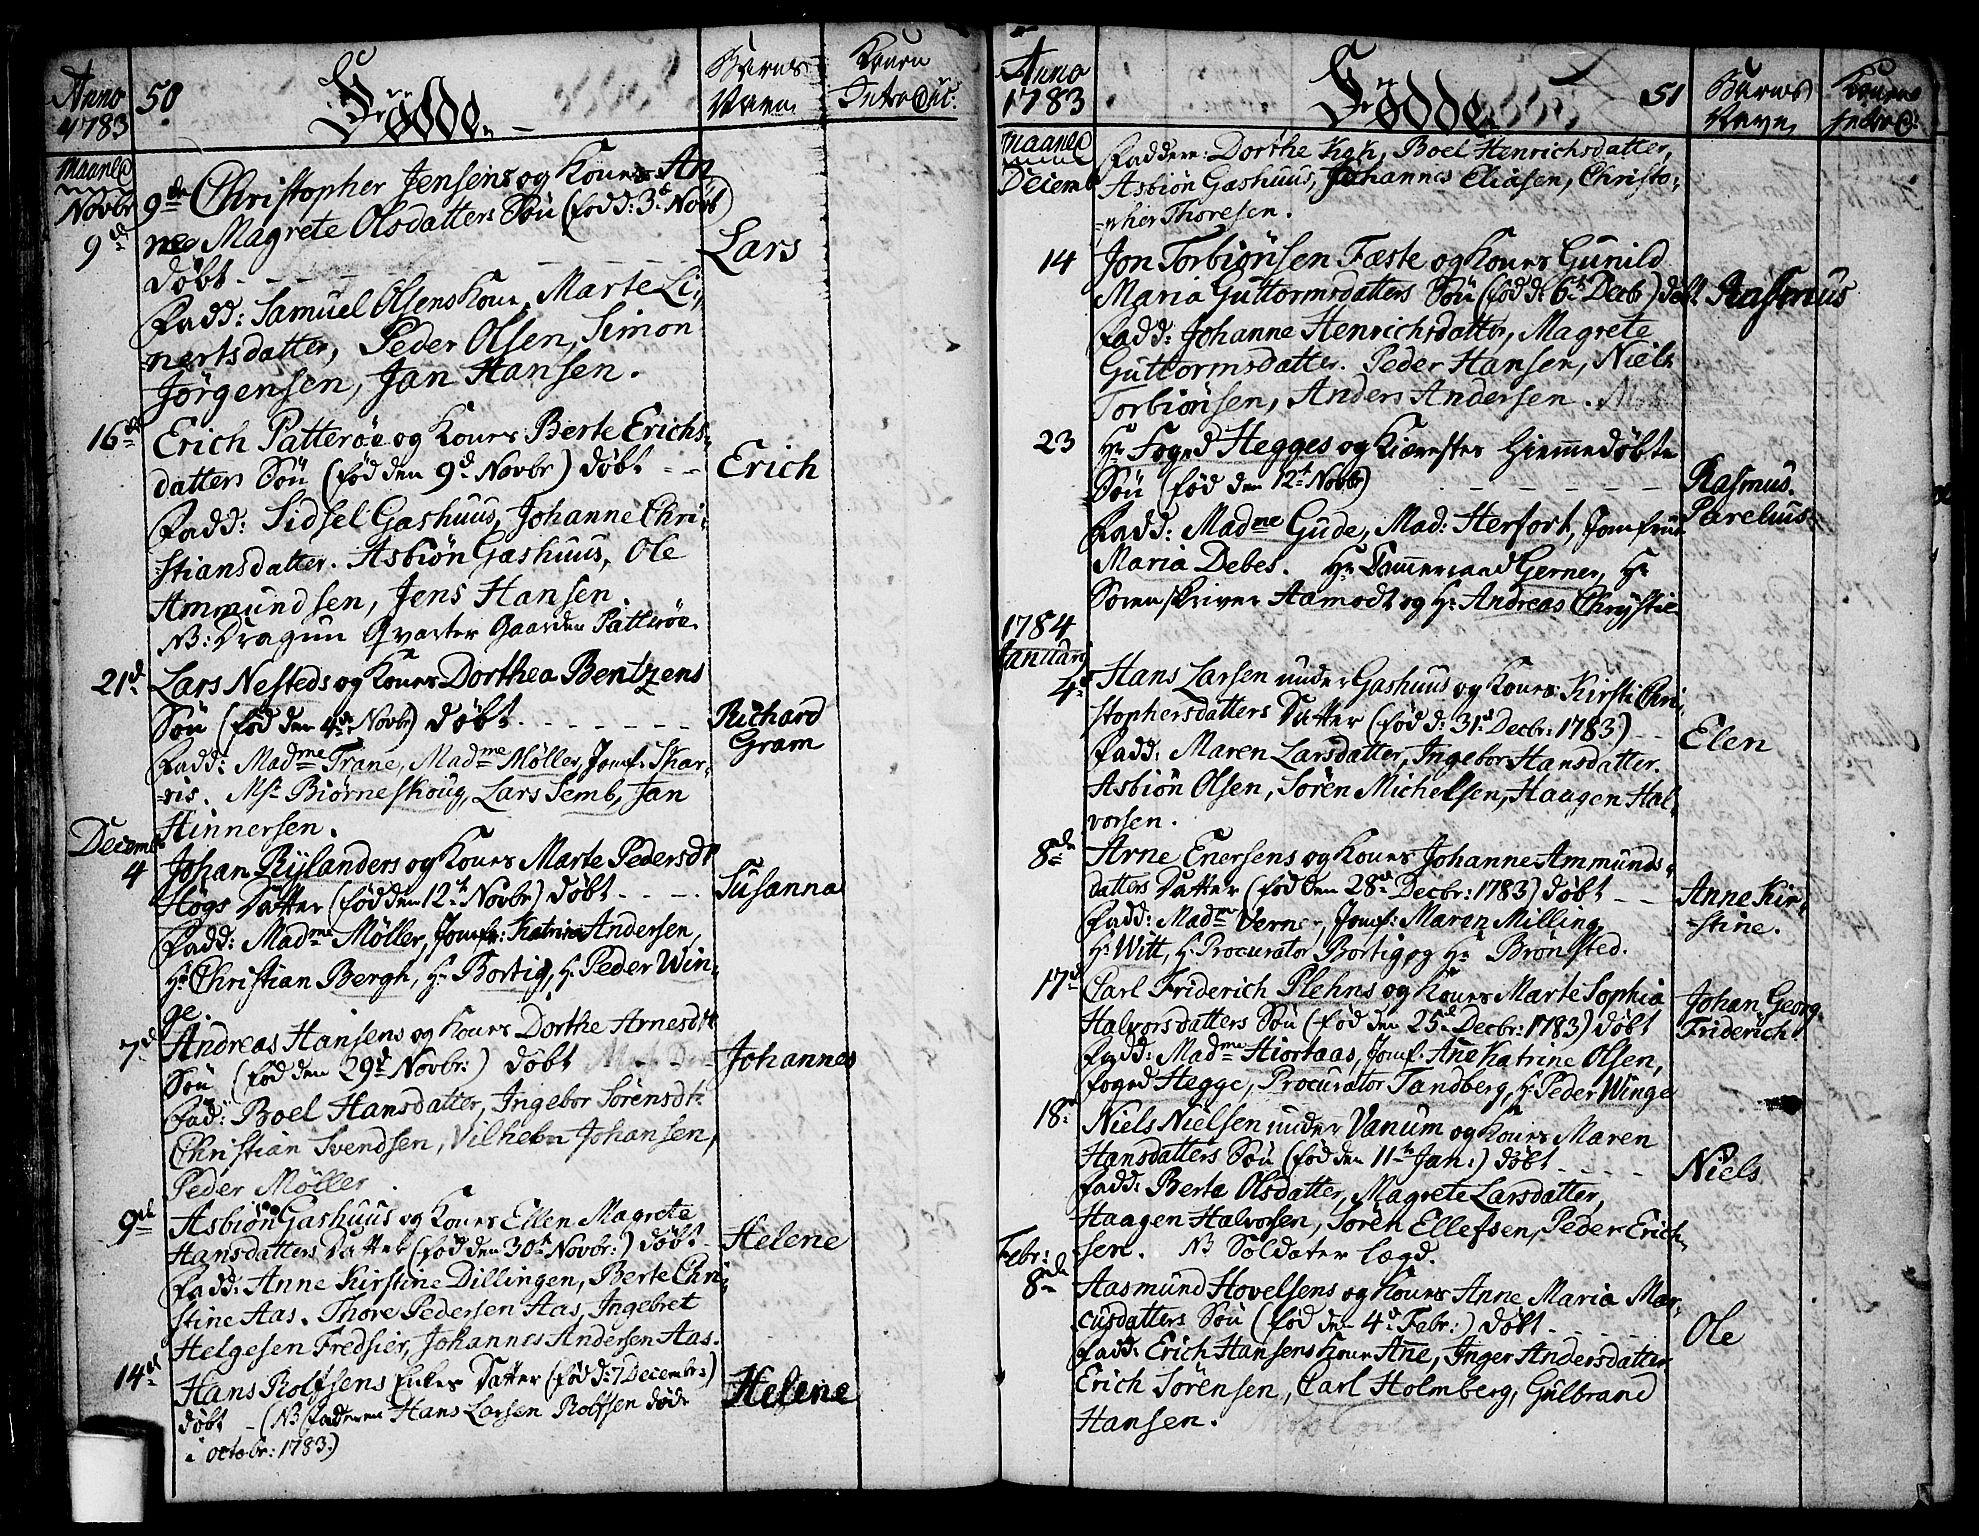 SAO, Moss prestekontor Kirkebøker, F/Fa/Faa/L0003: Ministerialbok nr. I 3, 1779-1814, s. 50-51